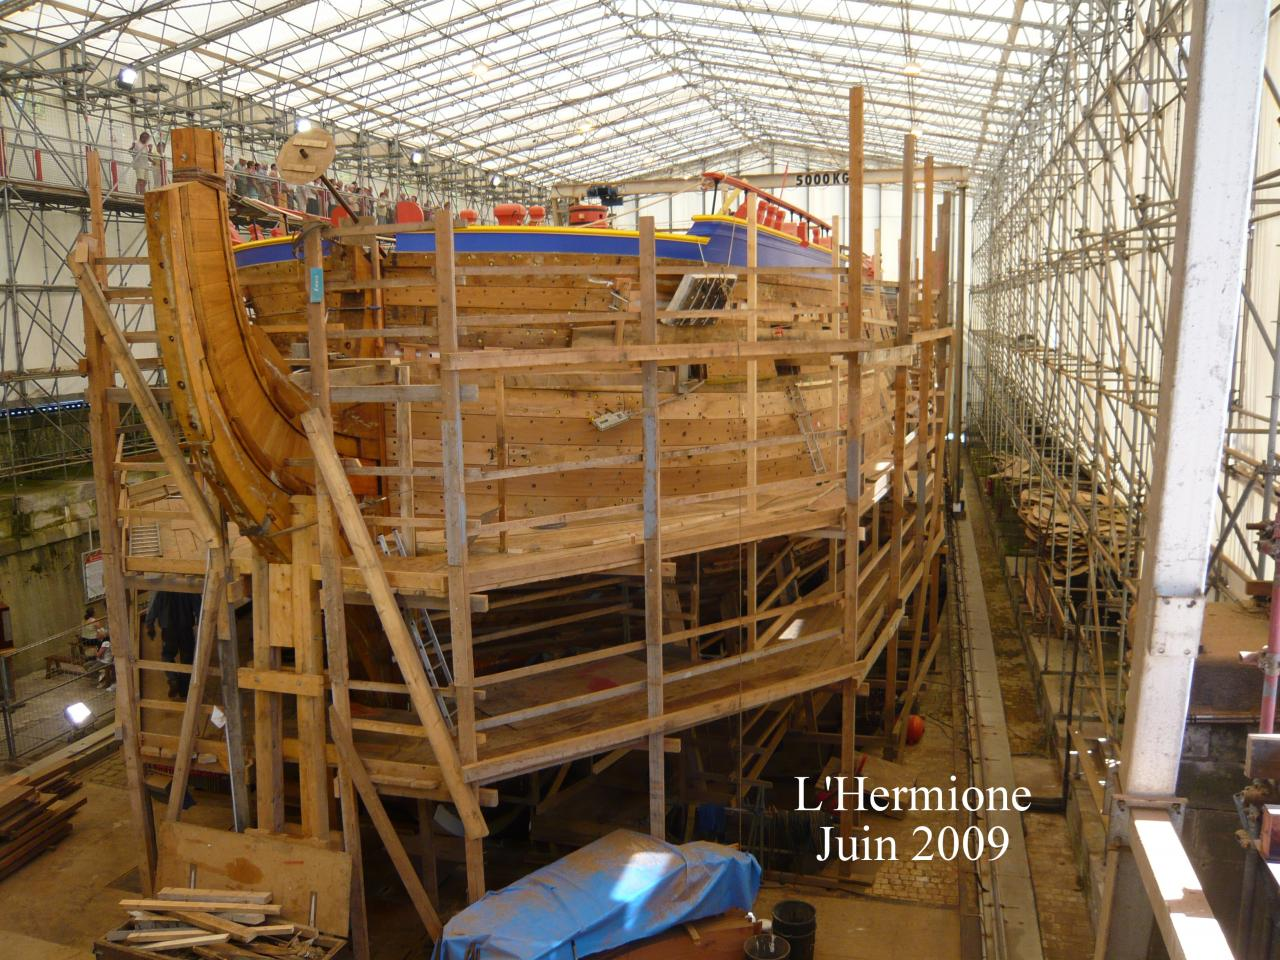 L hermione rochefort sur mer 6 juillet 2013 for Rochefort construction